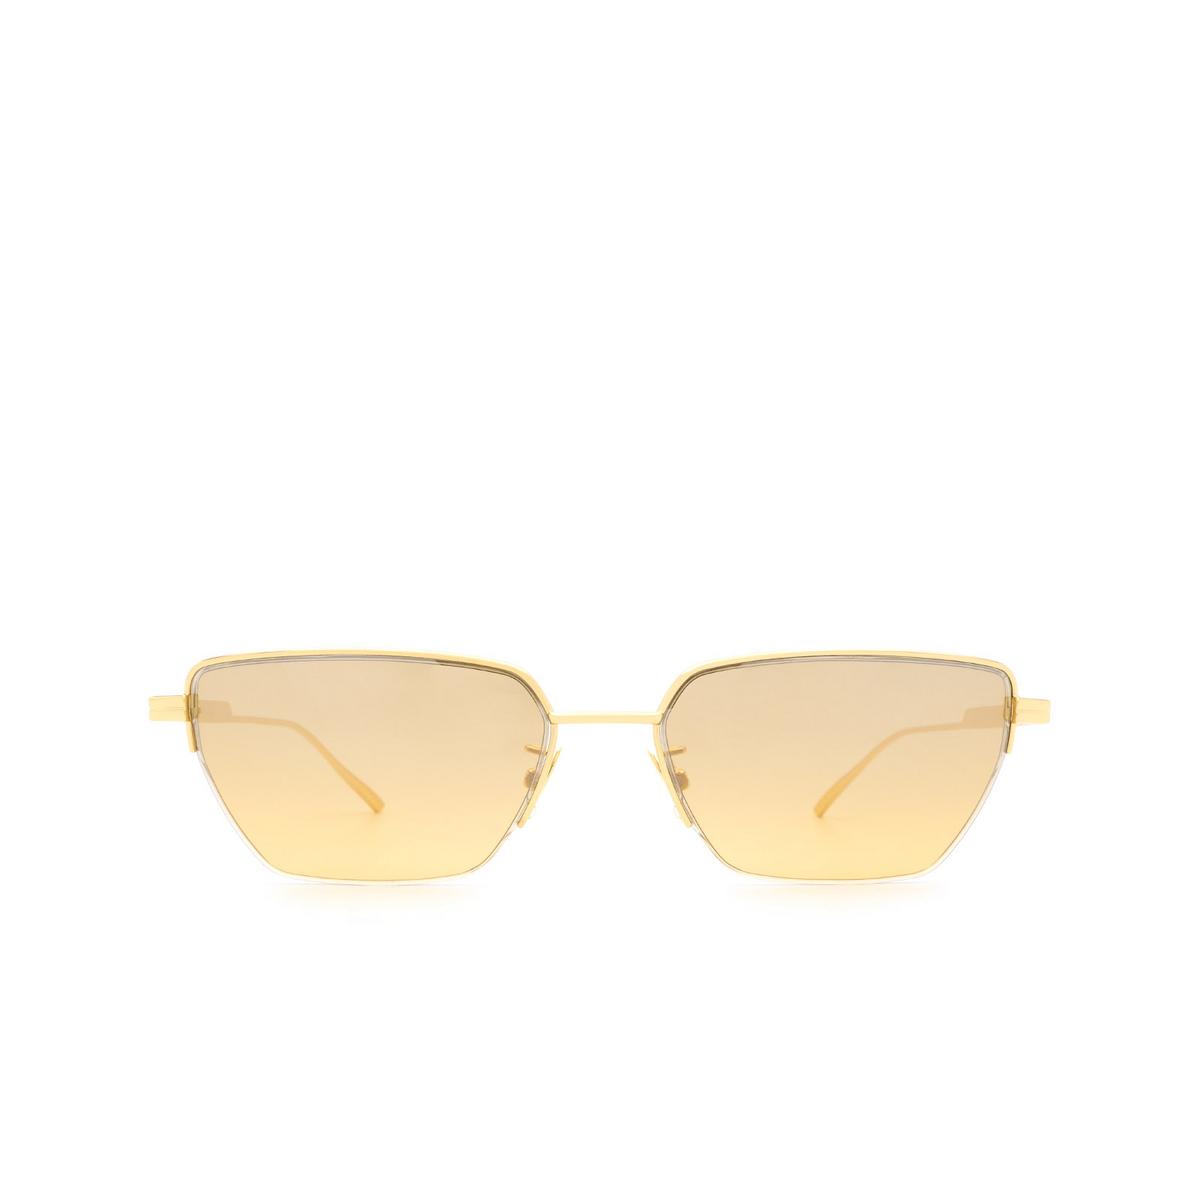 Bottega Veneta® Rectangle Sunglasses: BV1107S color Gold 002 - front view.